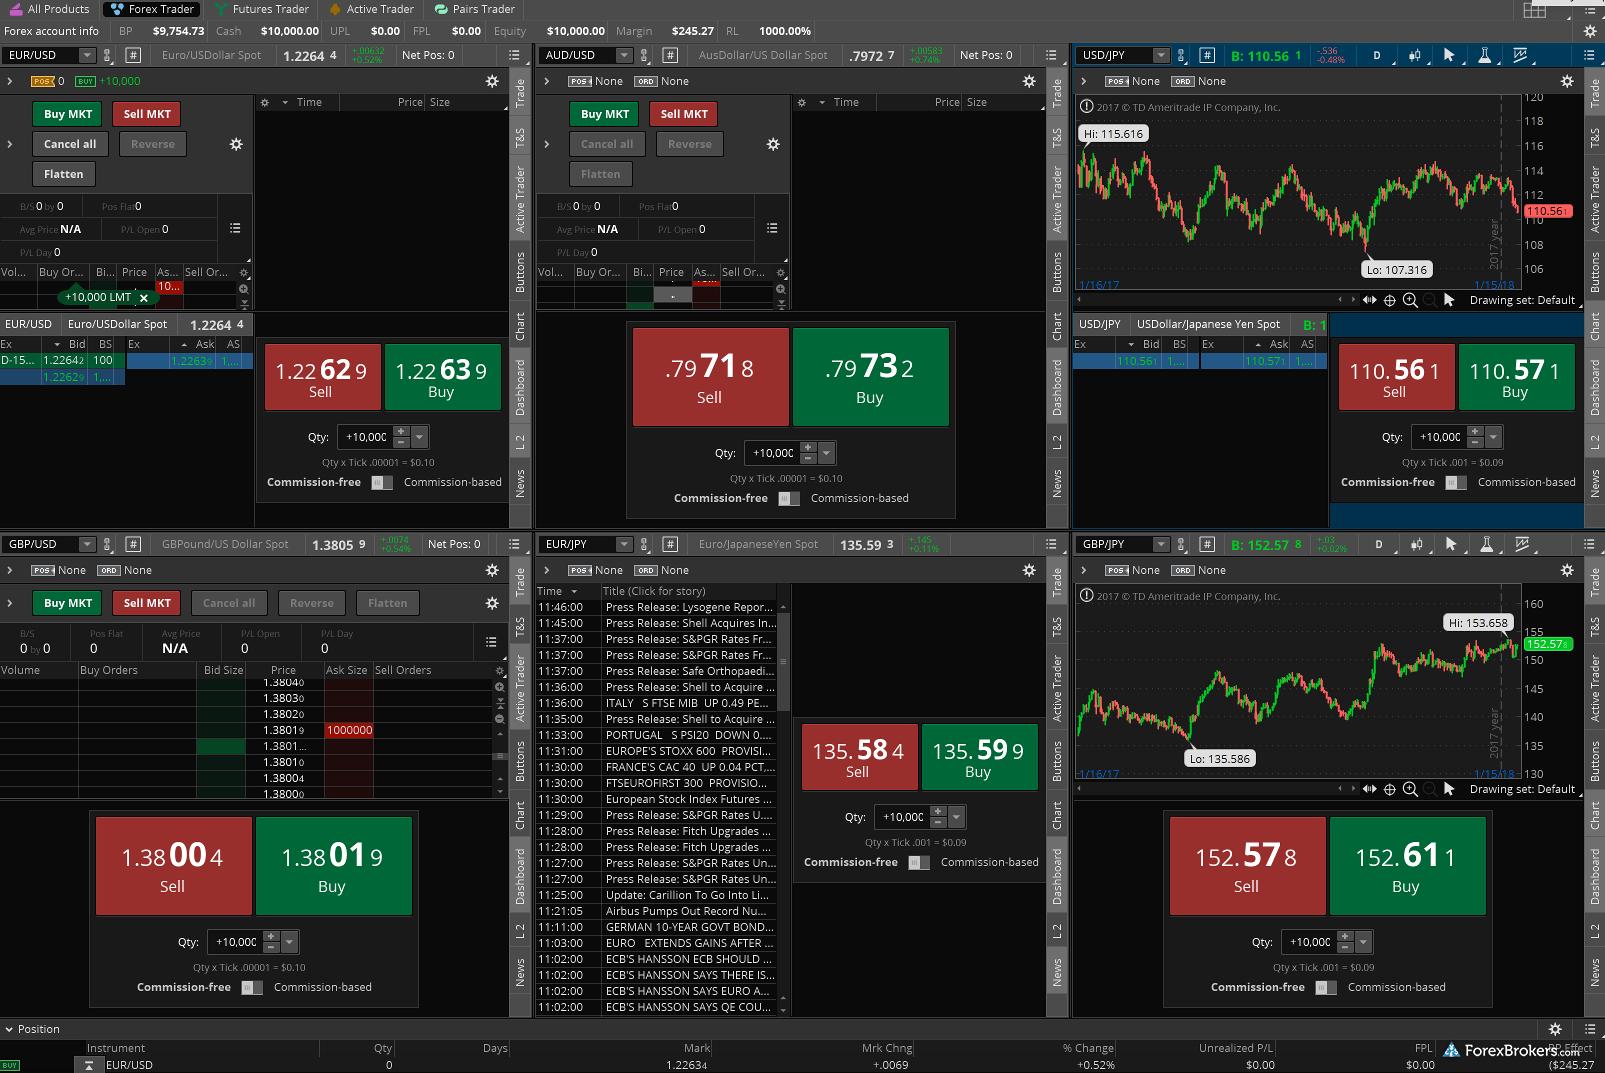 fx trader rates